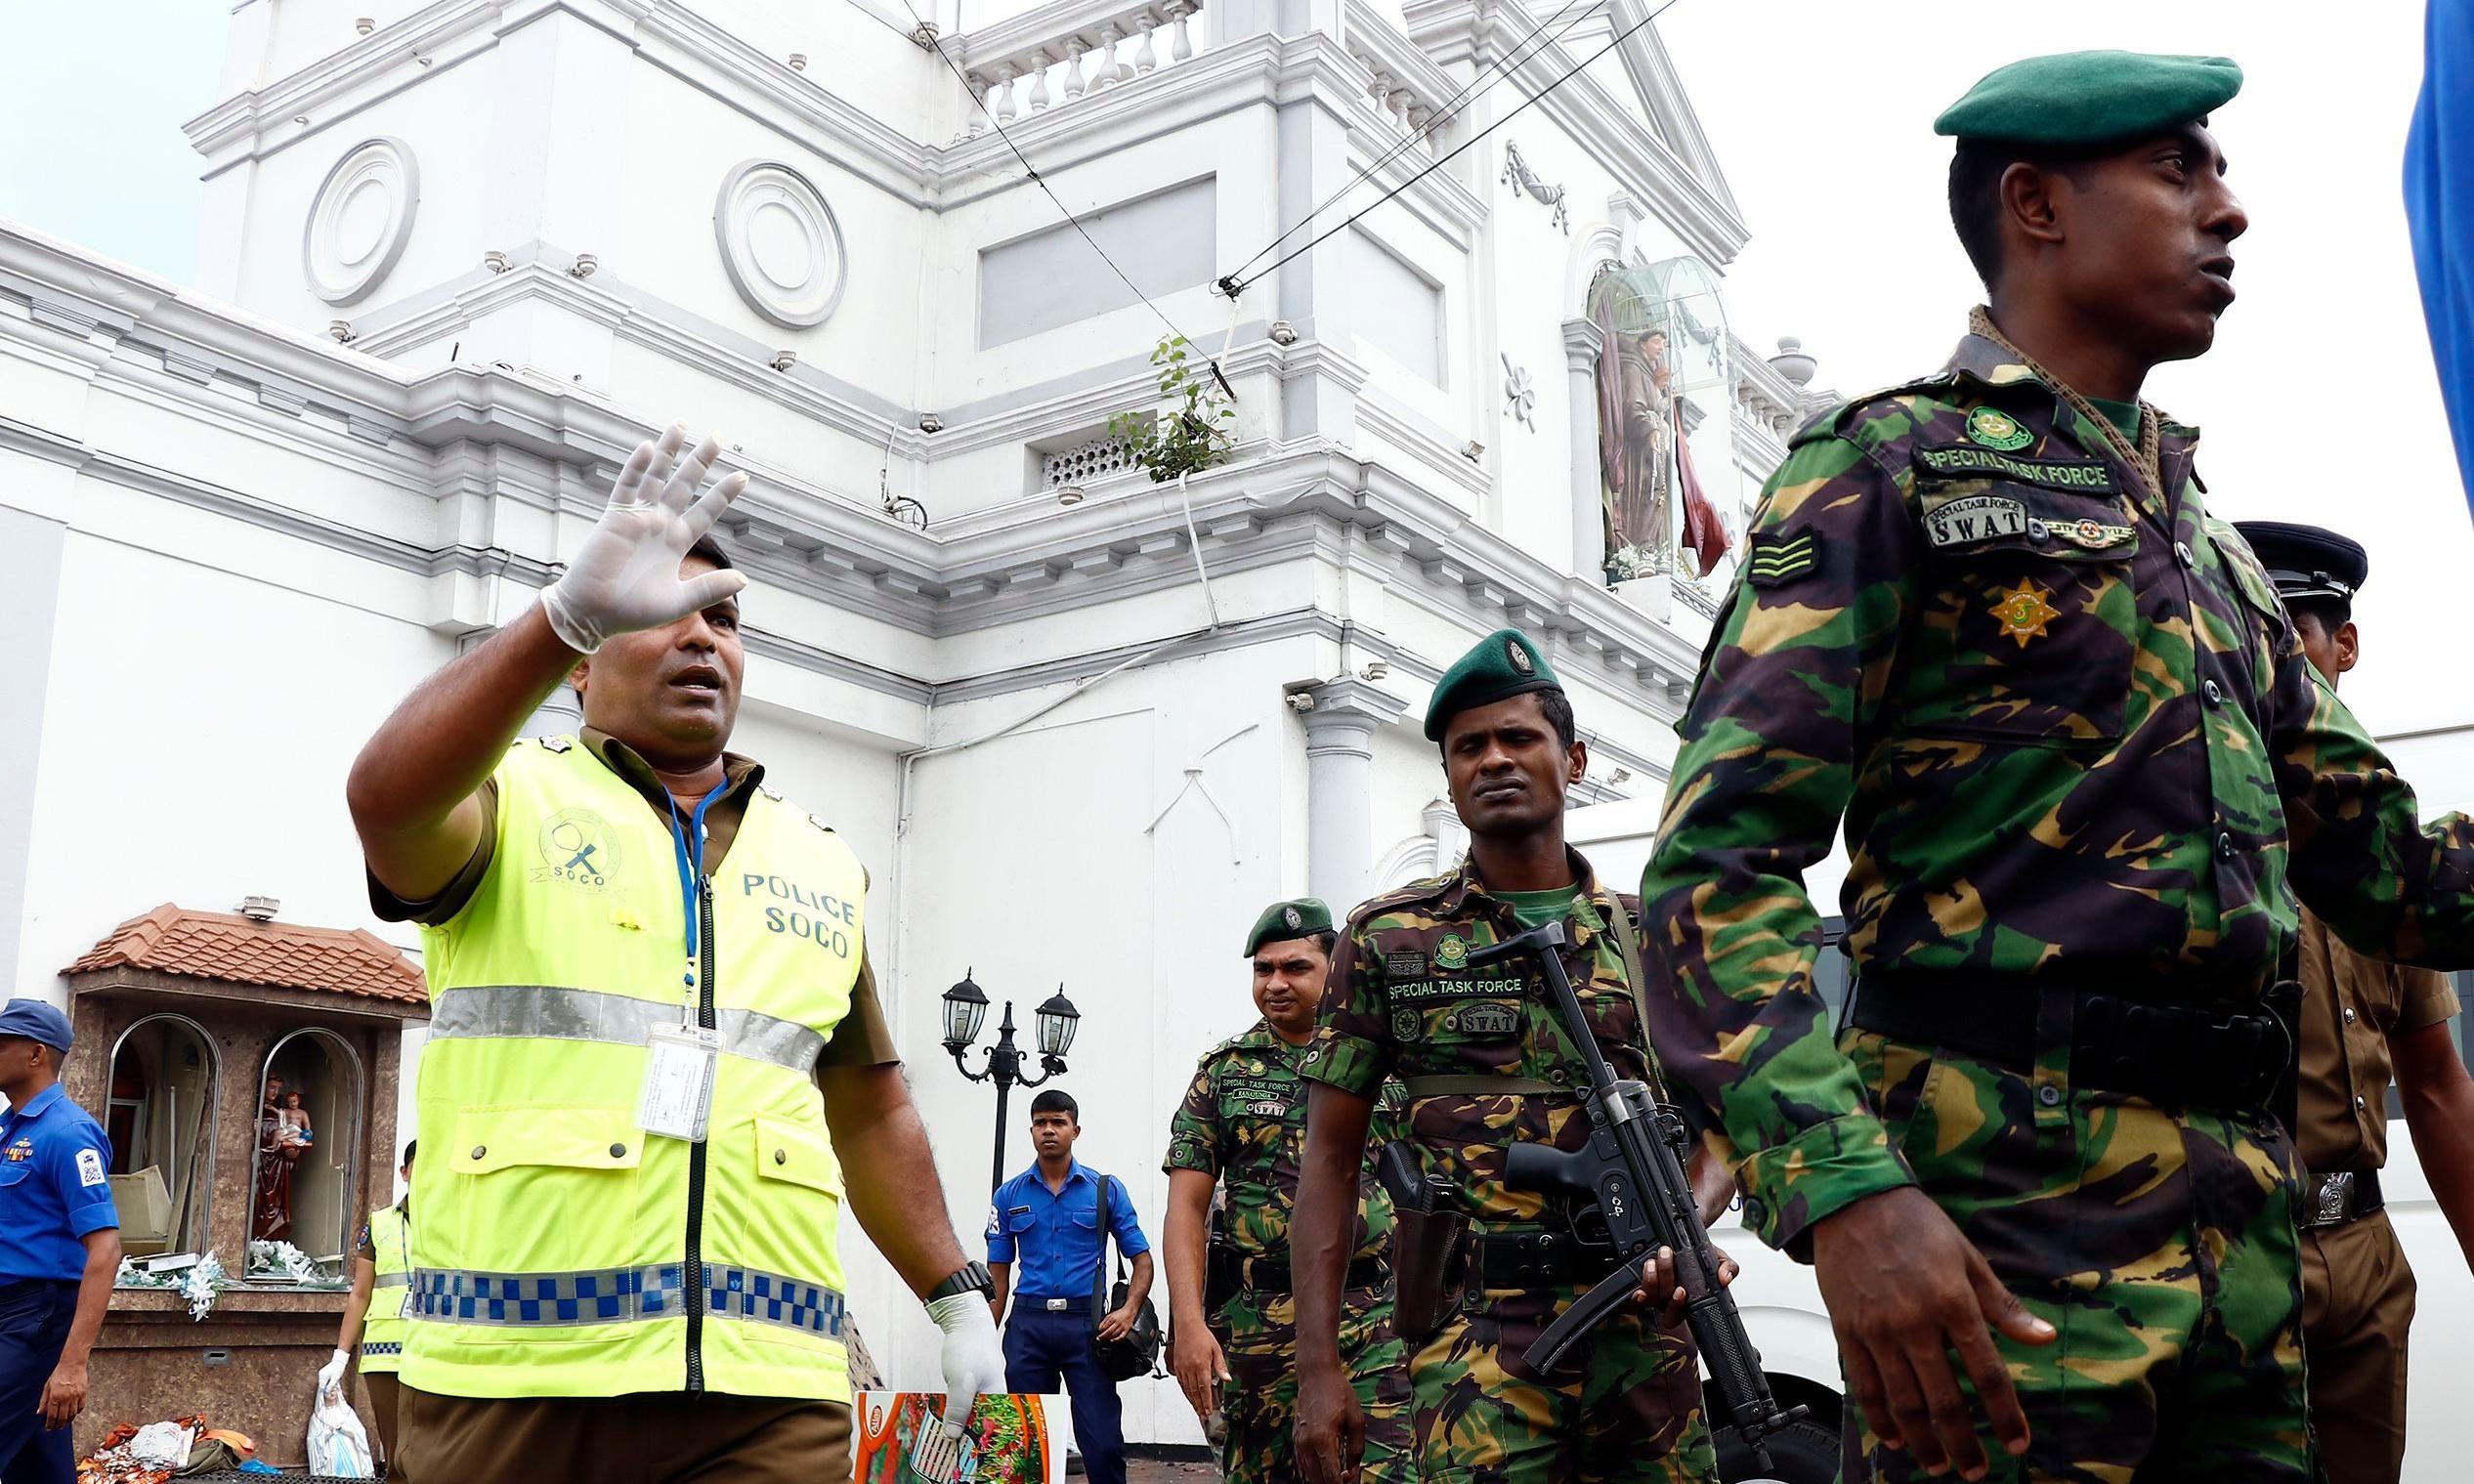 Sri Lanka caught off-guard by attacks despite its violent recent past